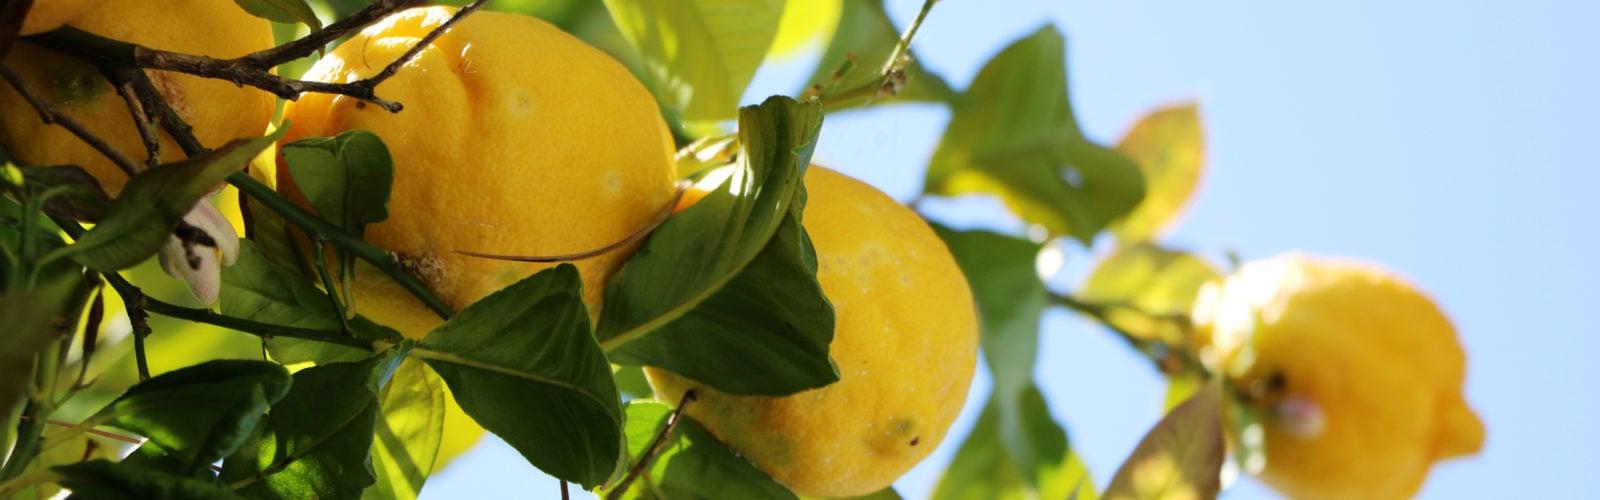 Lemons on a tree, Amalfi Coast, Italy